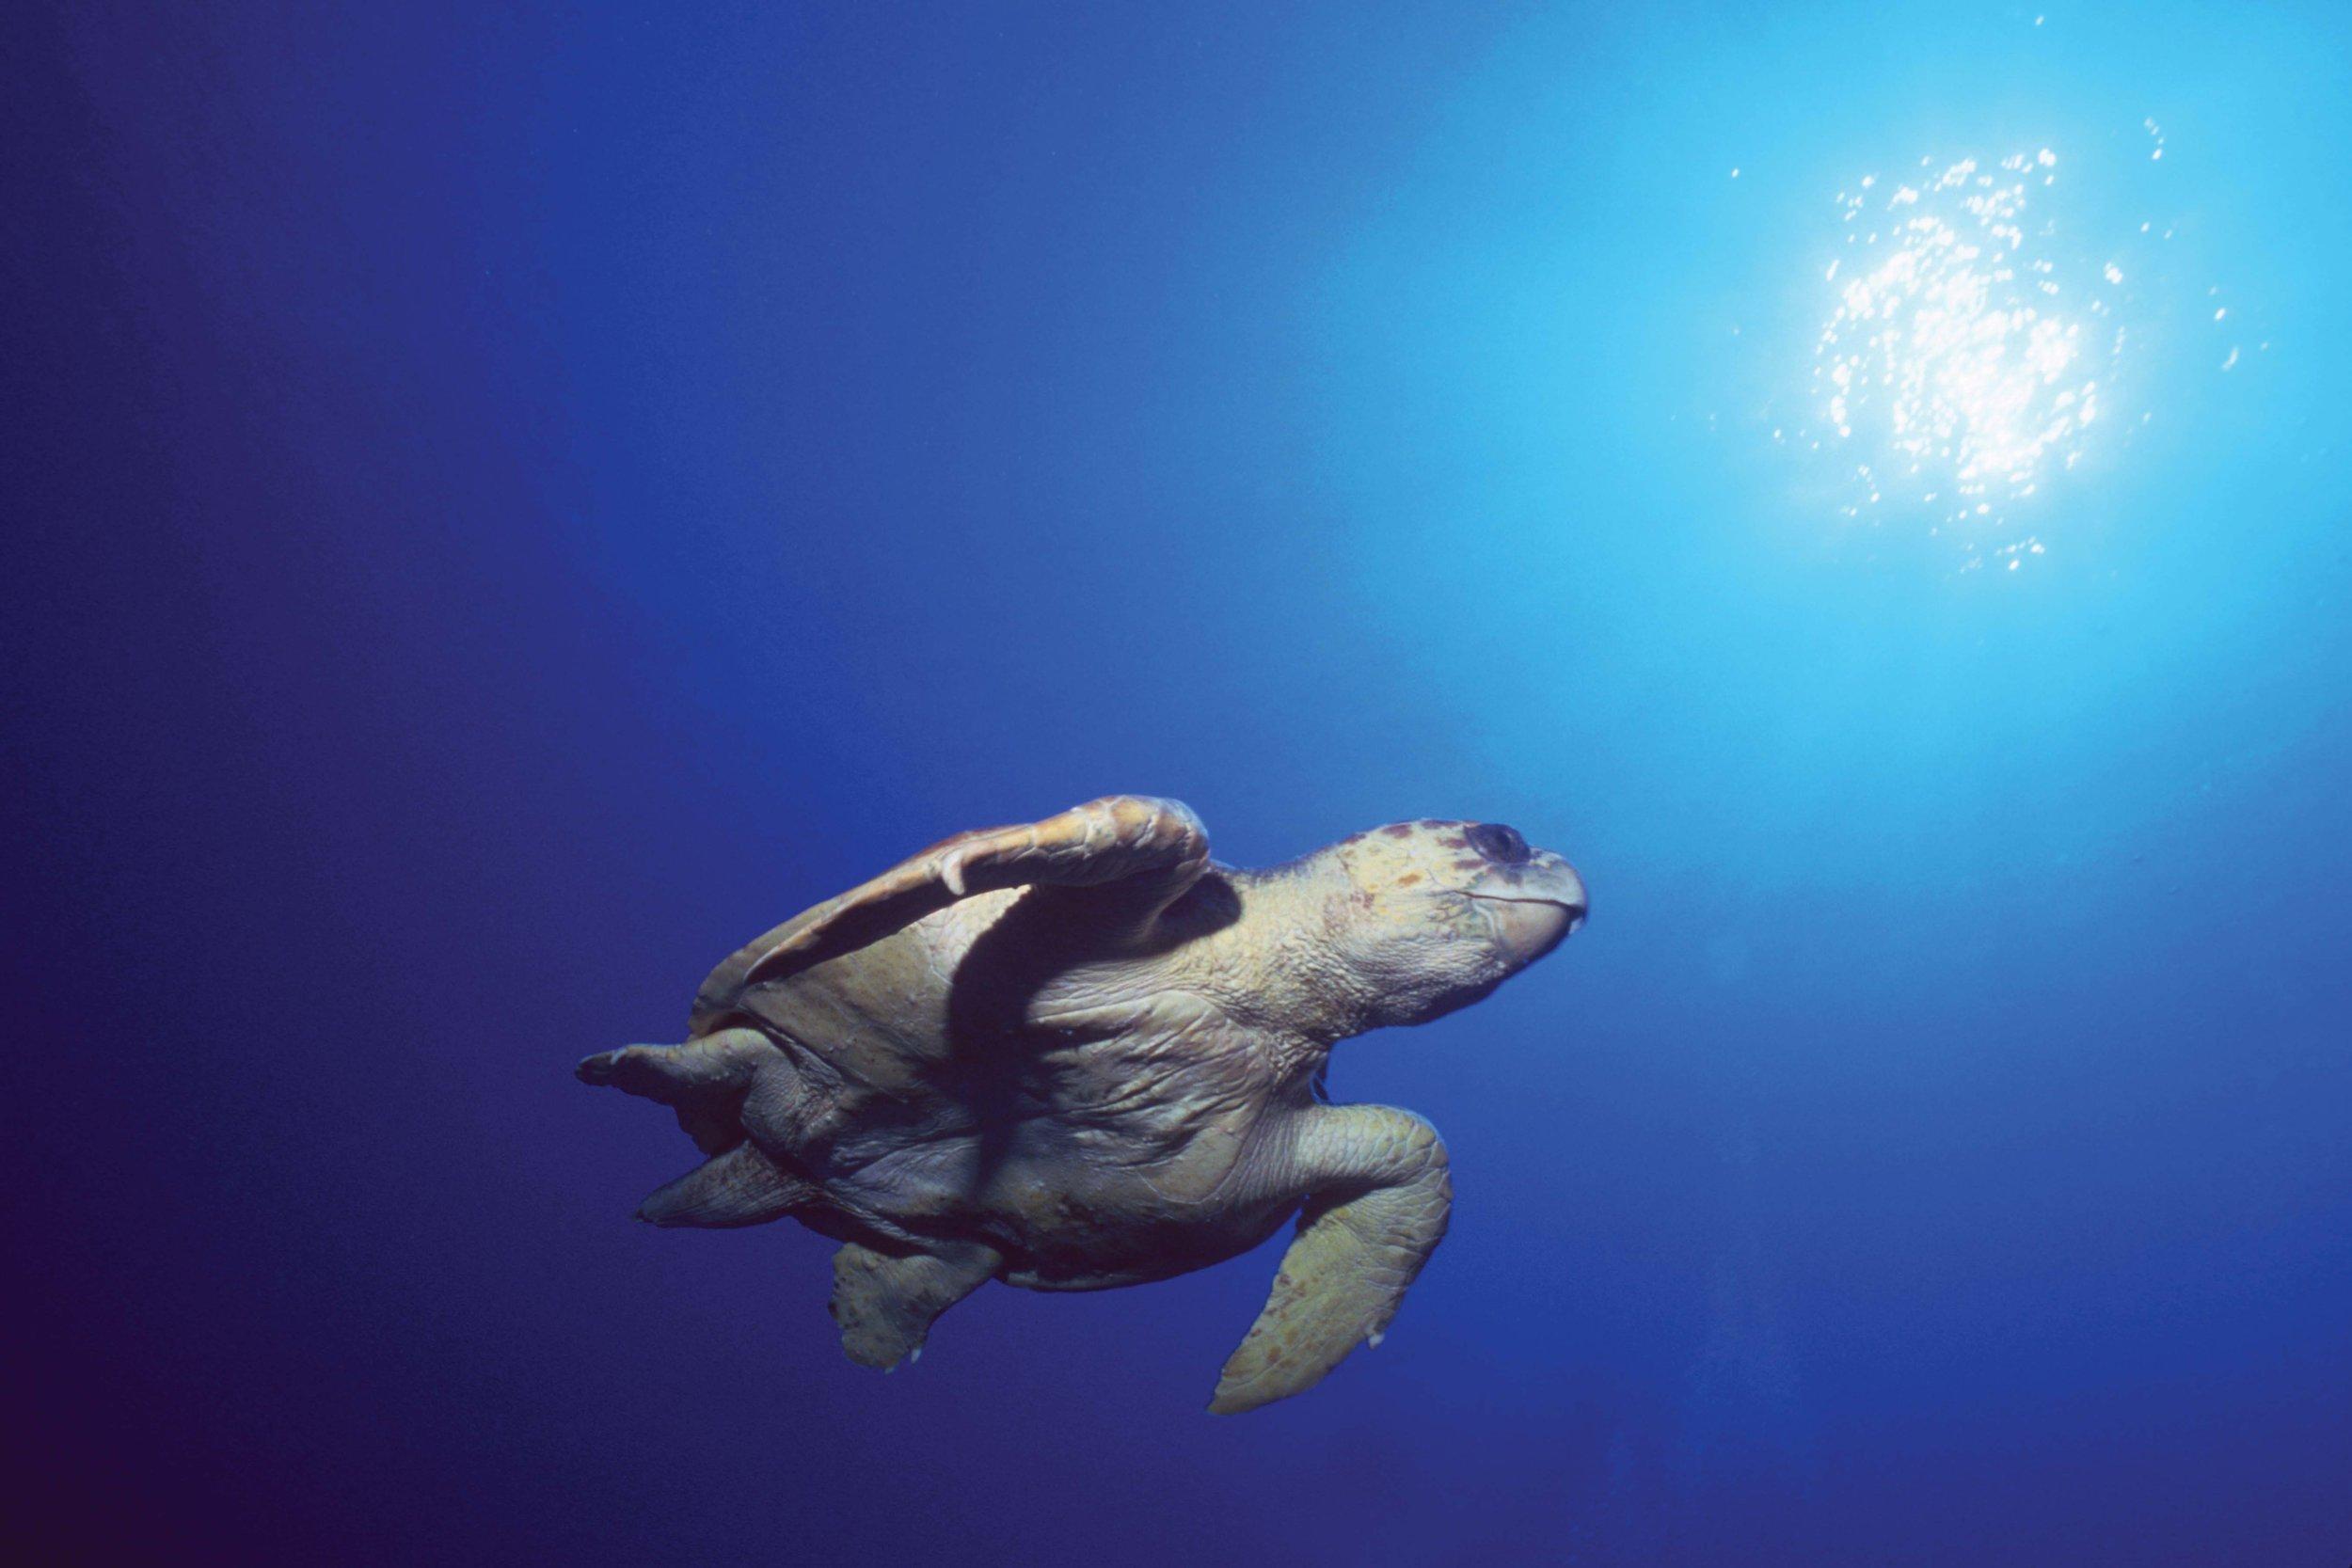 A loggerhead turtle swims in The Bahamas. © DOUG PERRINE / SEAPICS.COM